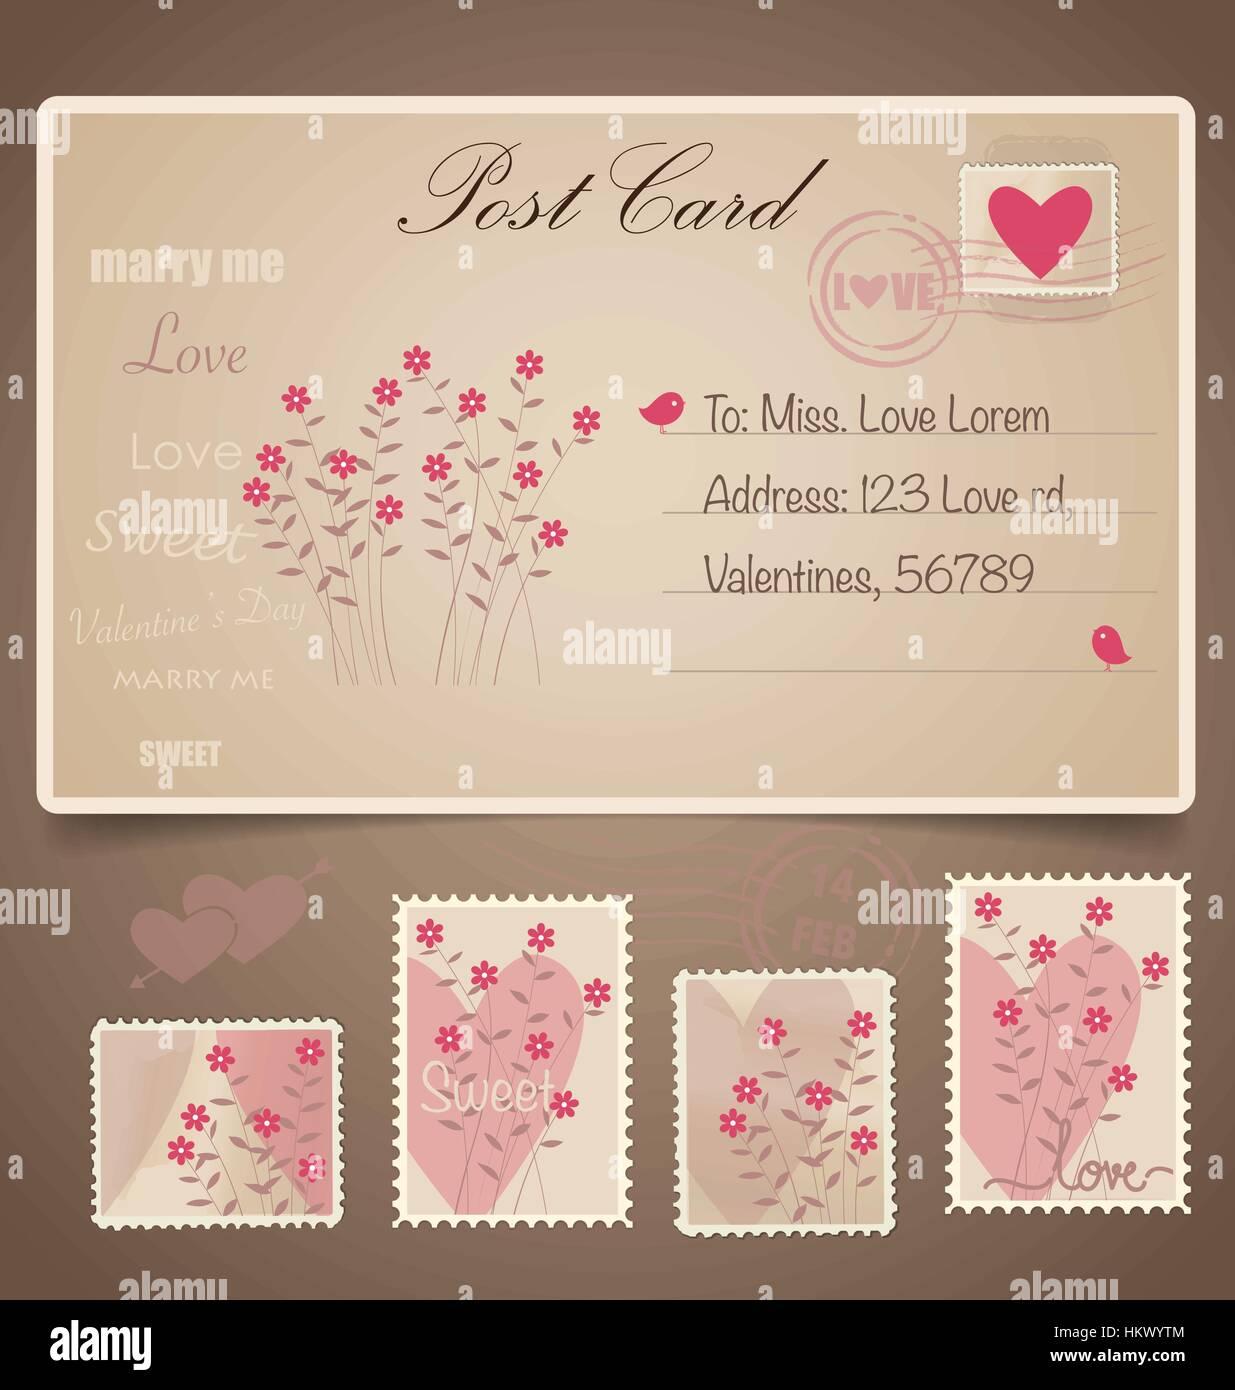 Vintage Postcard Background And Postage Stamps For Wedding